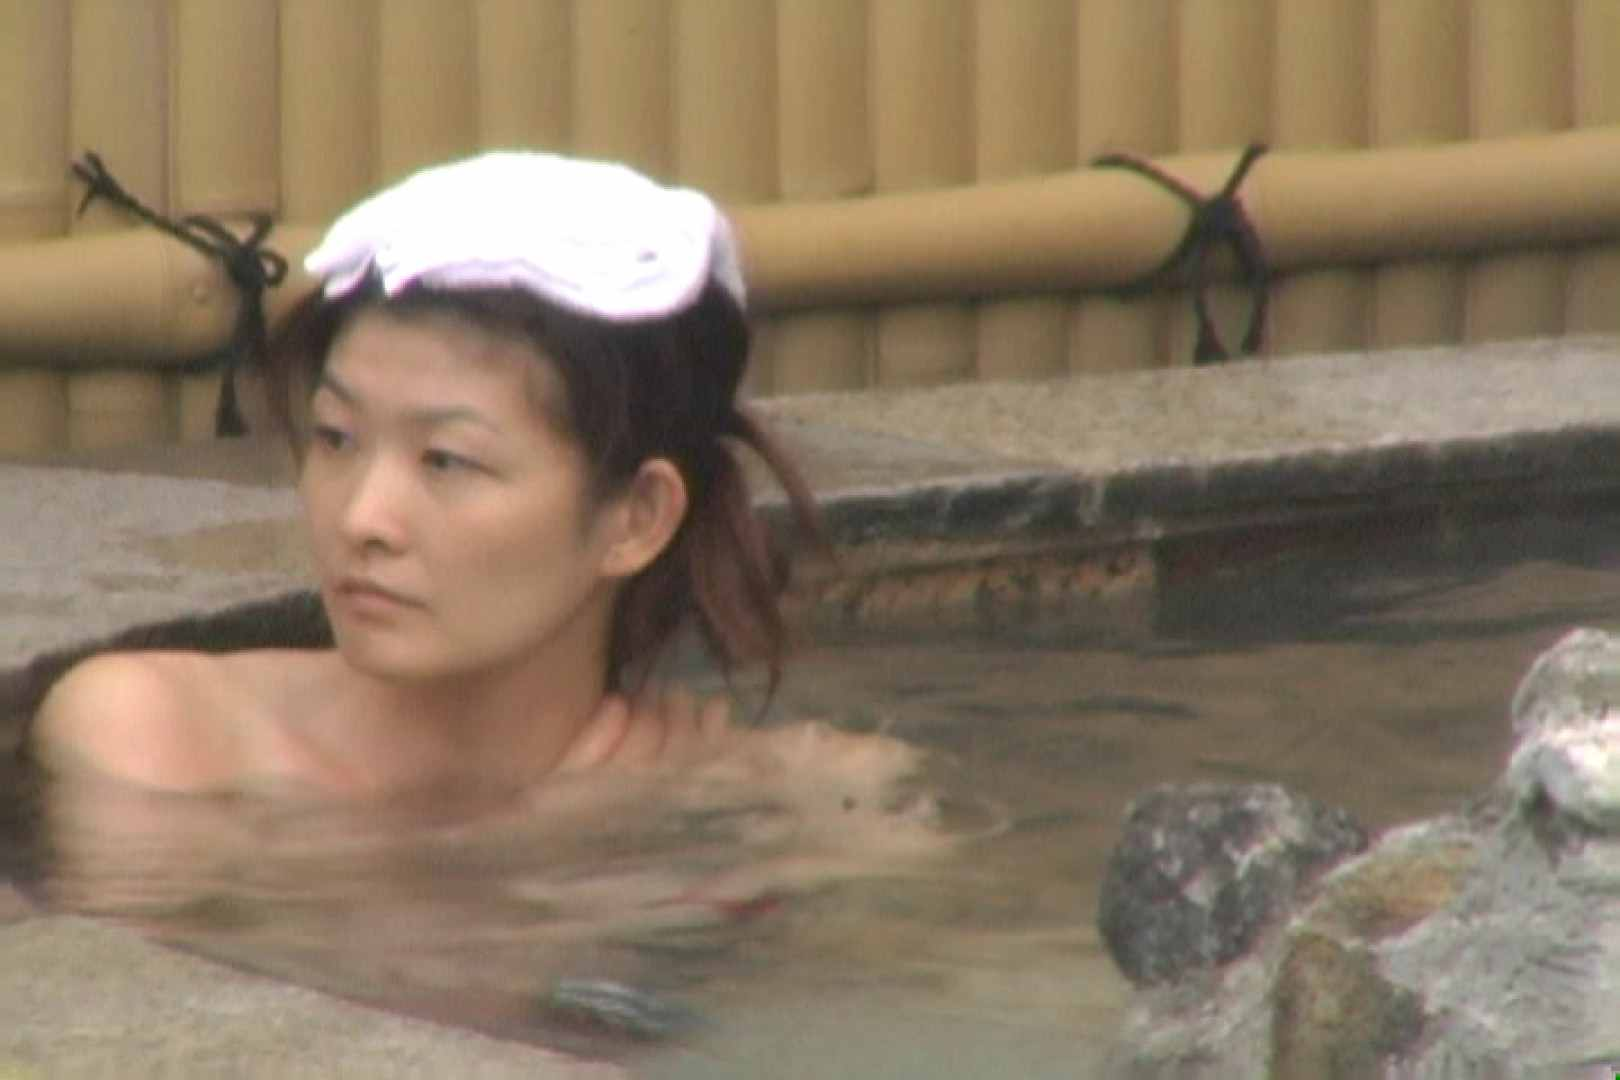 Aquaな露天風呂Vol.611 OLのエロ生活 おまんこ無修正動画無料 18連発 17